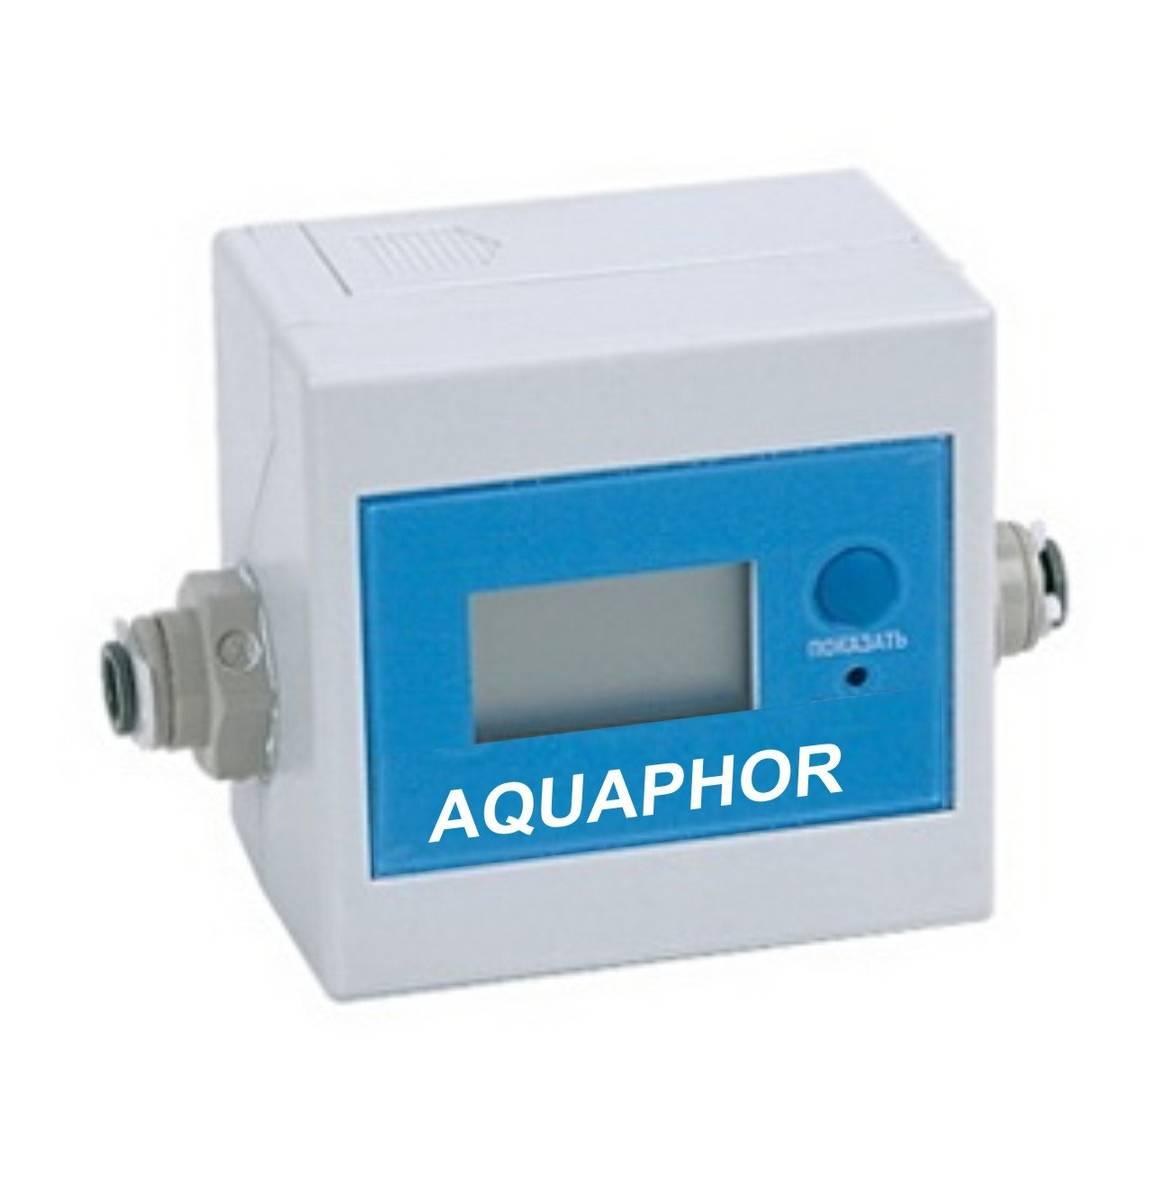 Aquaphor indikátor životnosti filtrů